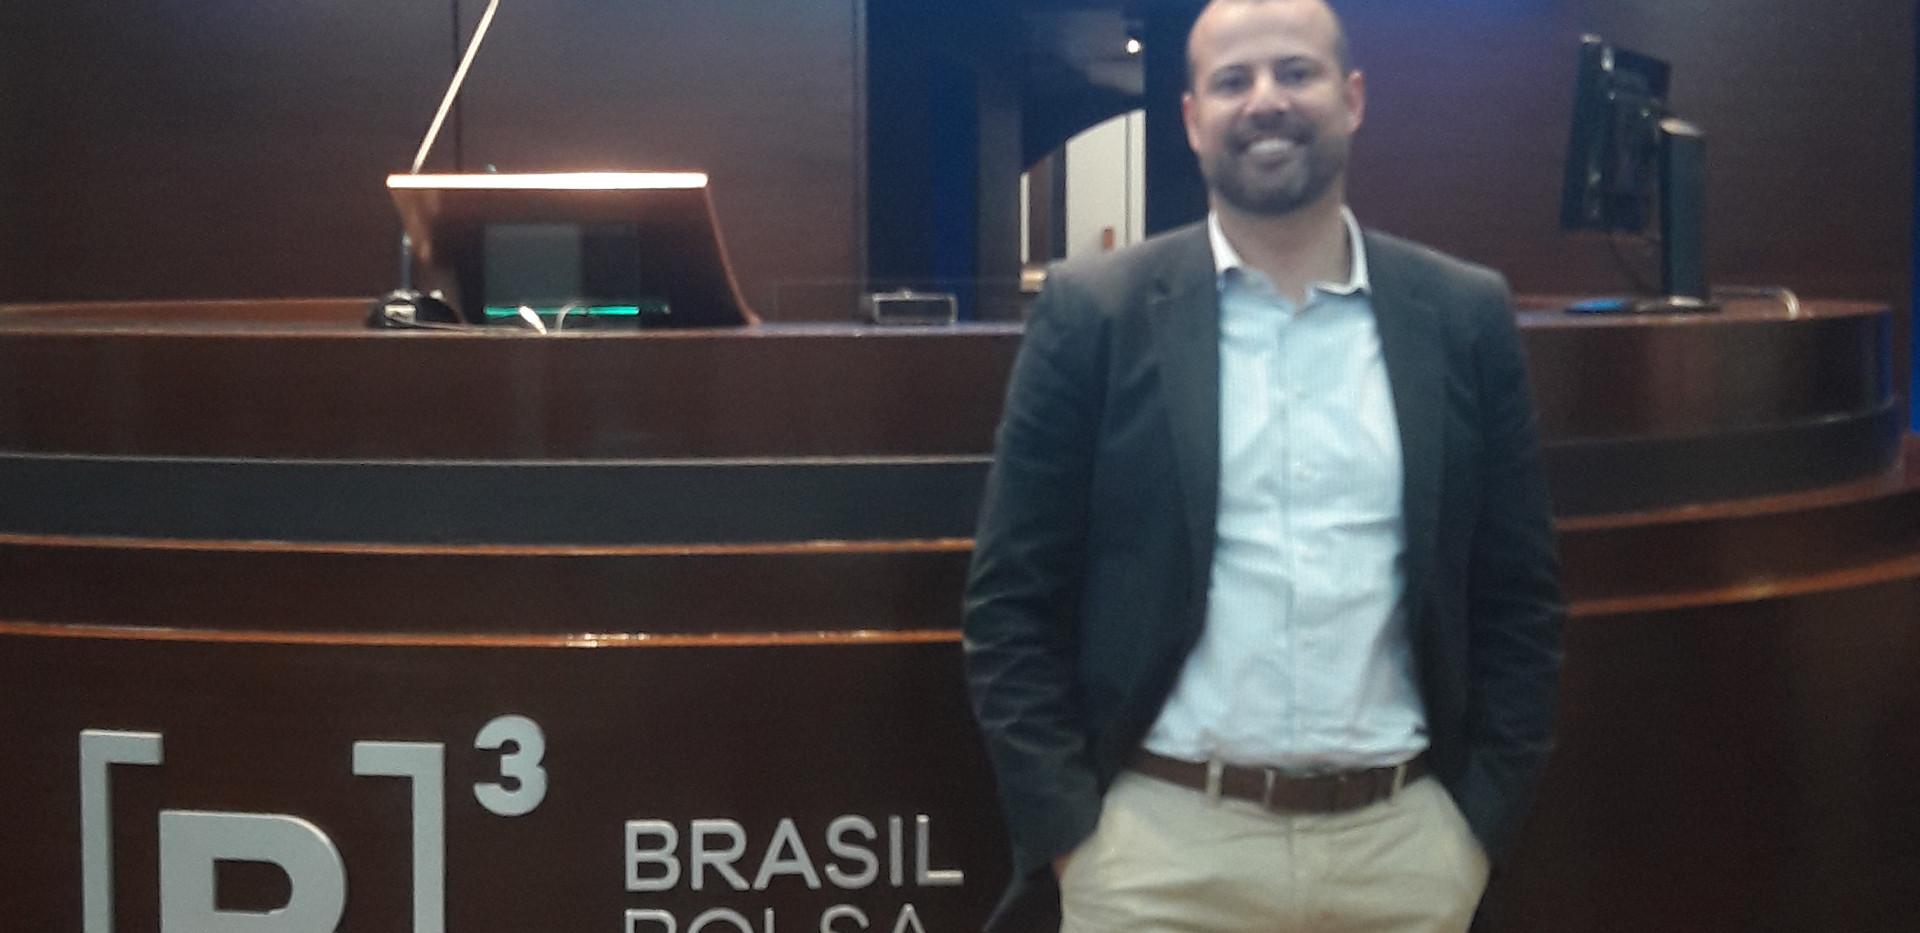 Visita a B3 - São Paulo